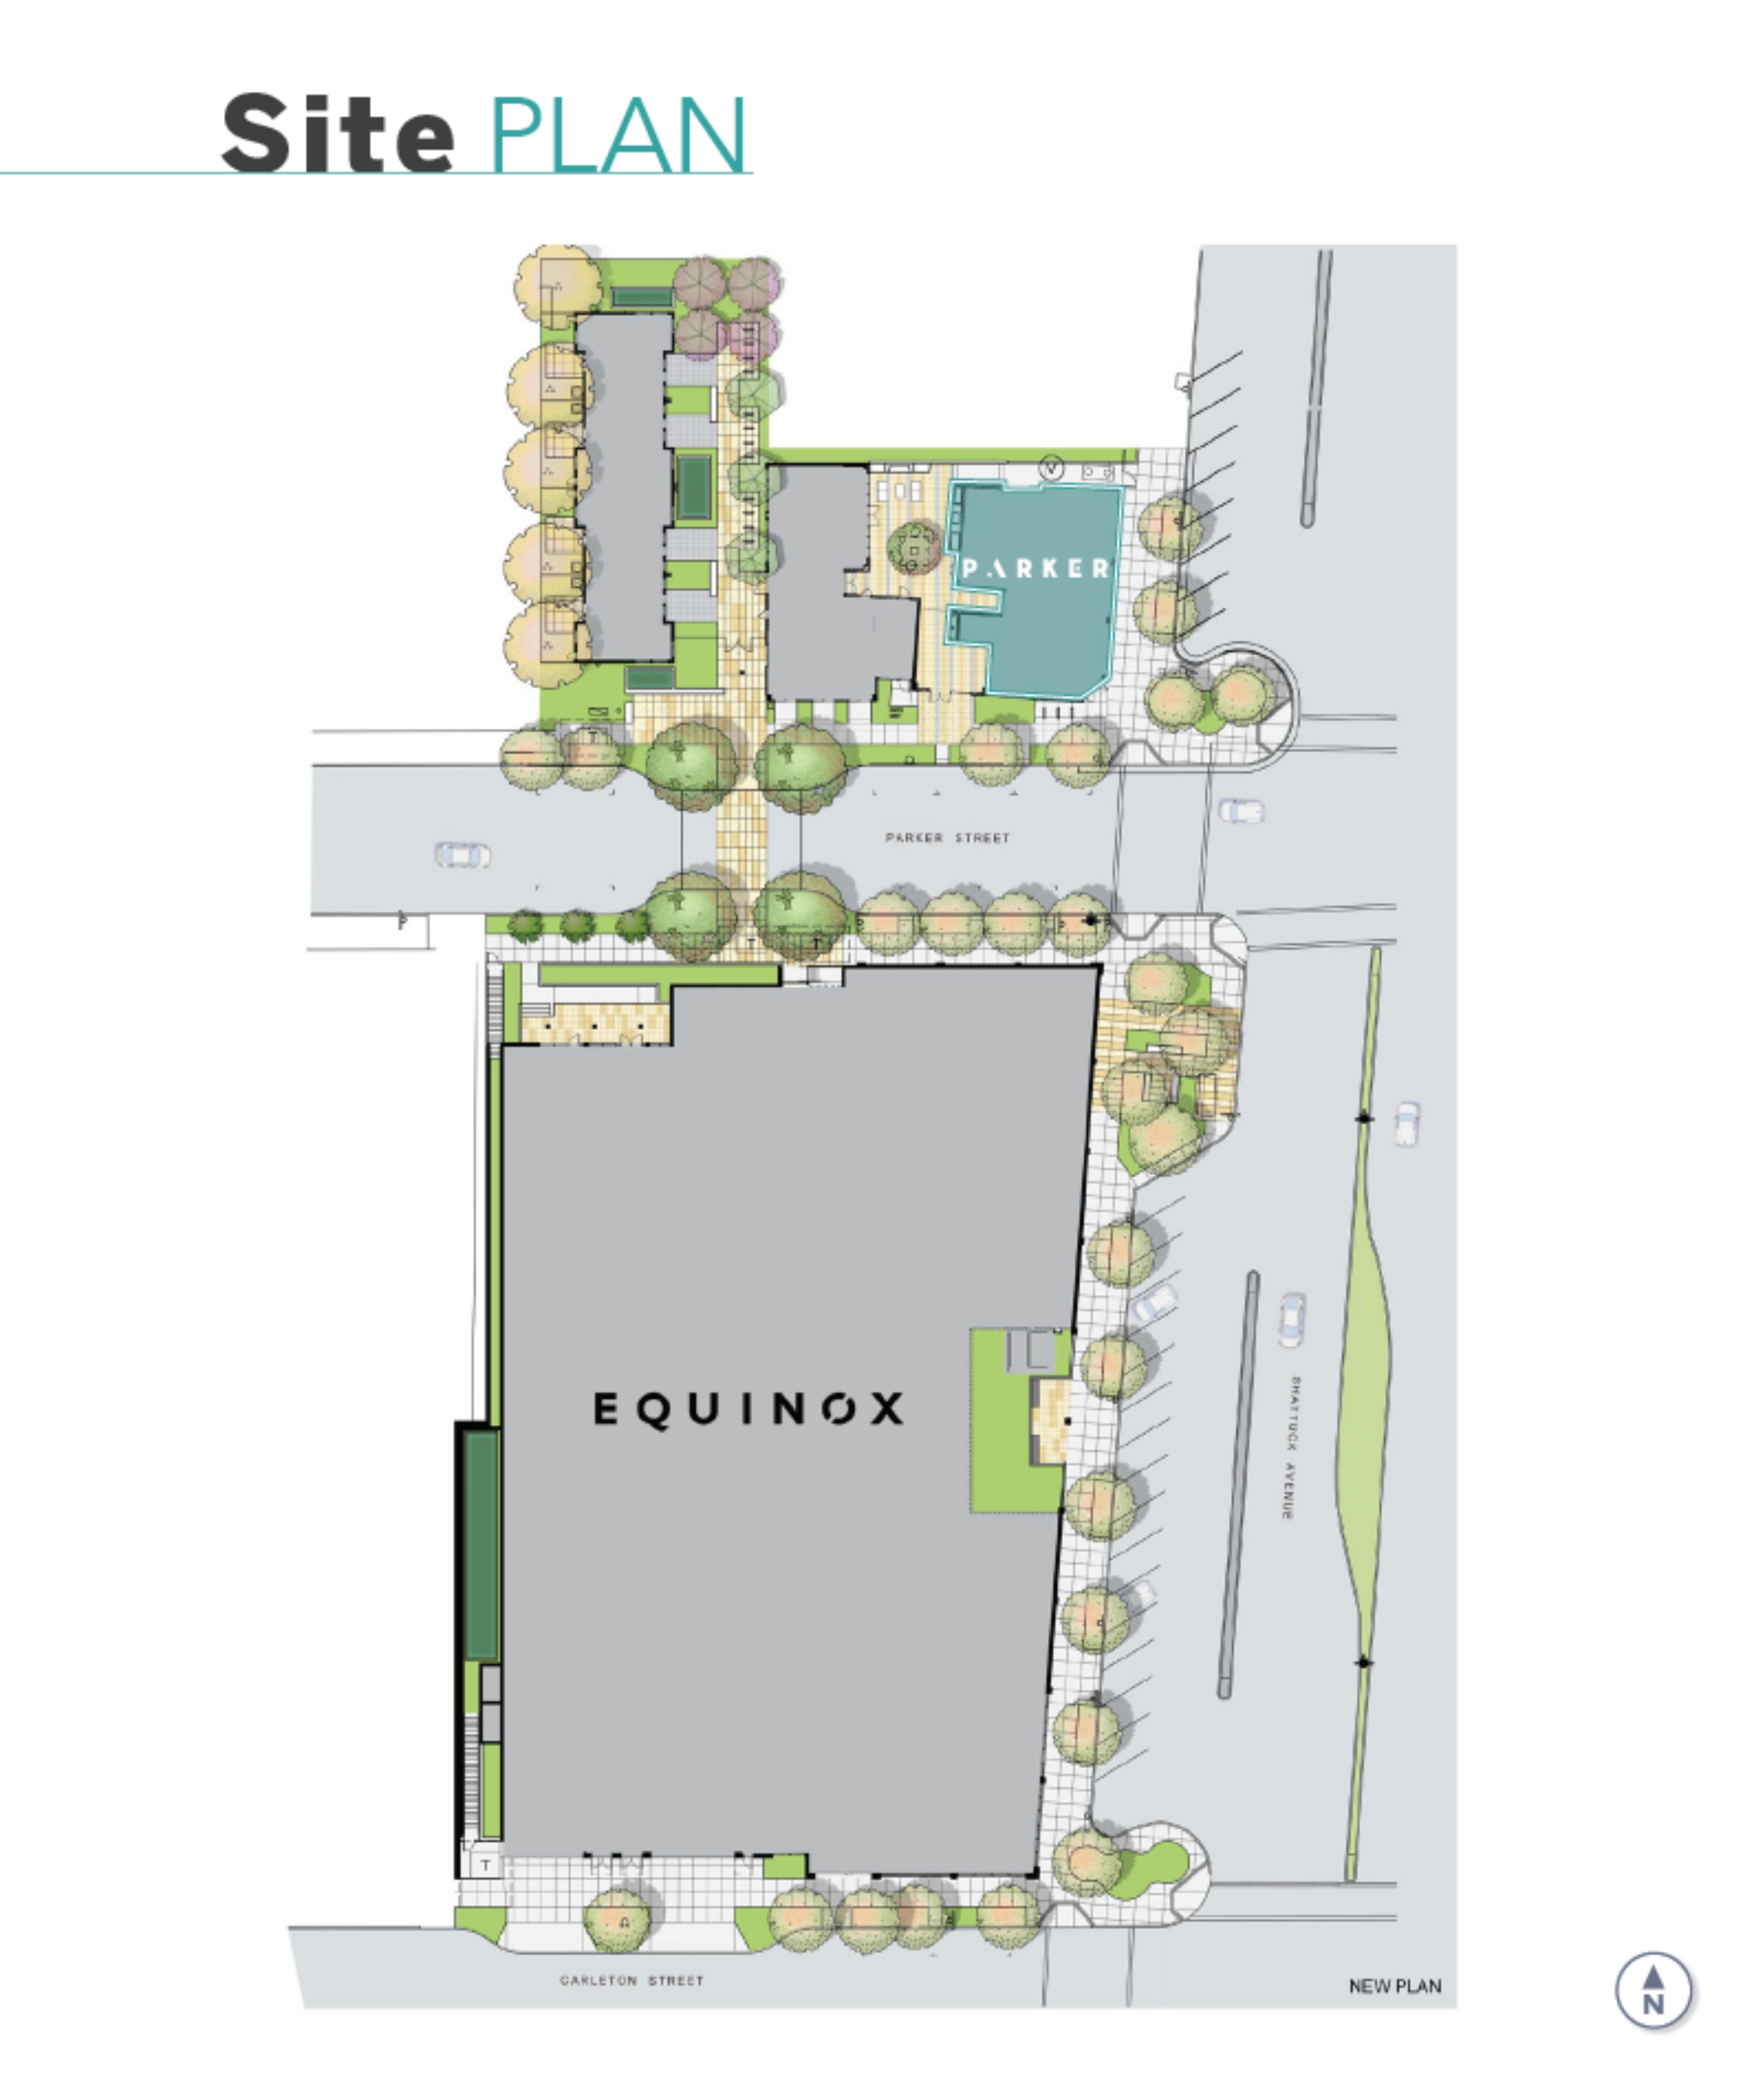 2598 Shattuck Avenue: site plan